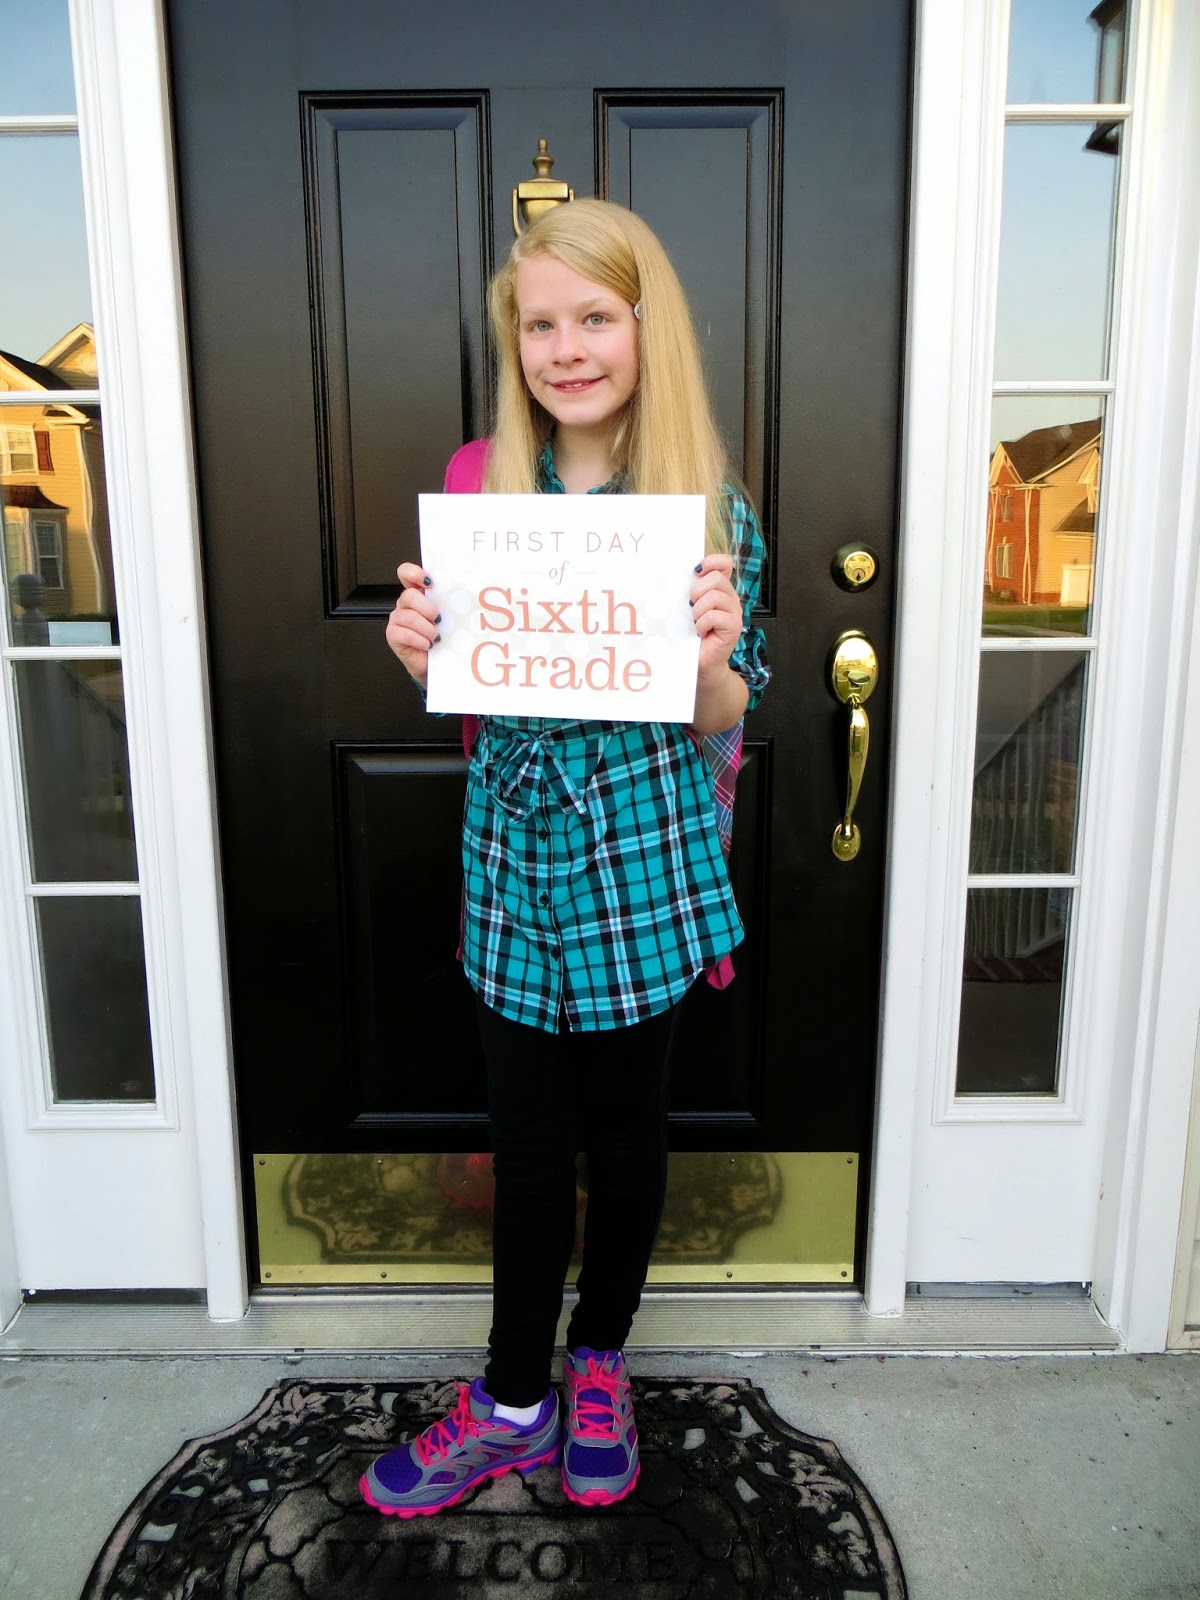 6th grade girl